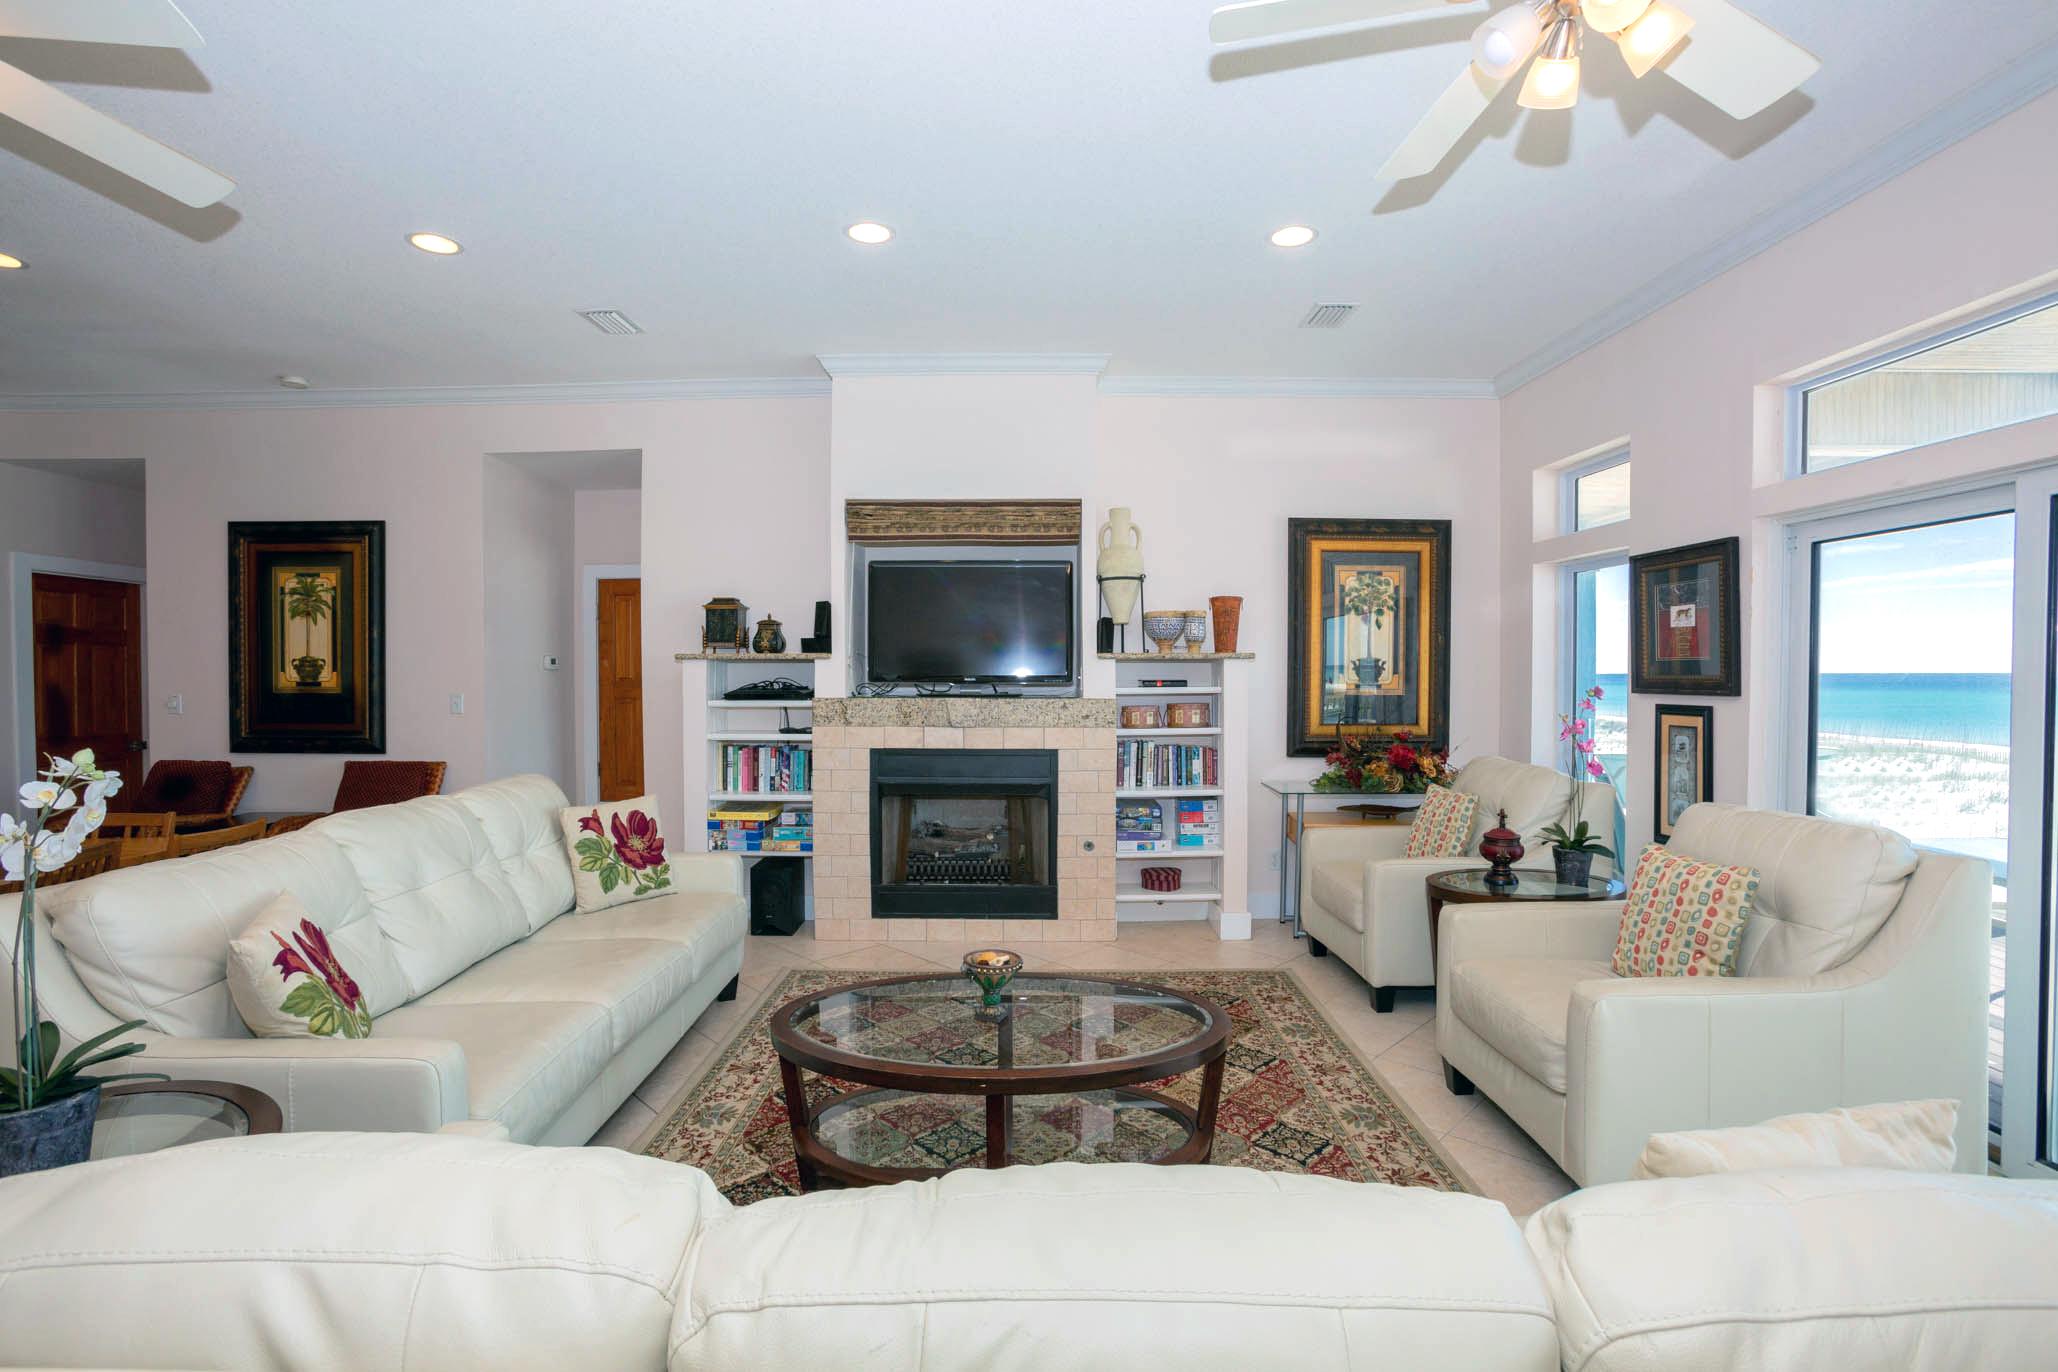 Ariola 1214 House/Cottage rental in Luxury Homes in Pensacola Beach Florida - #8